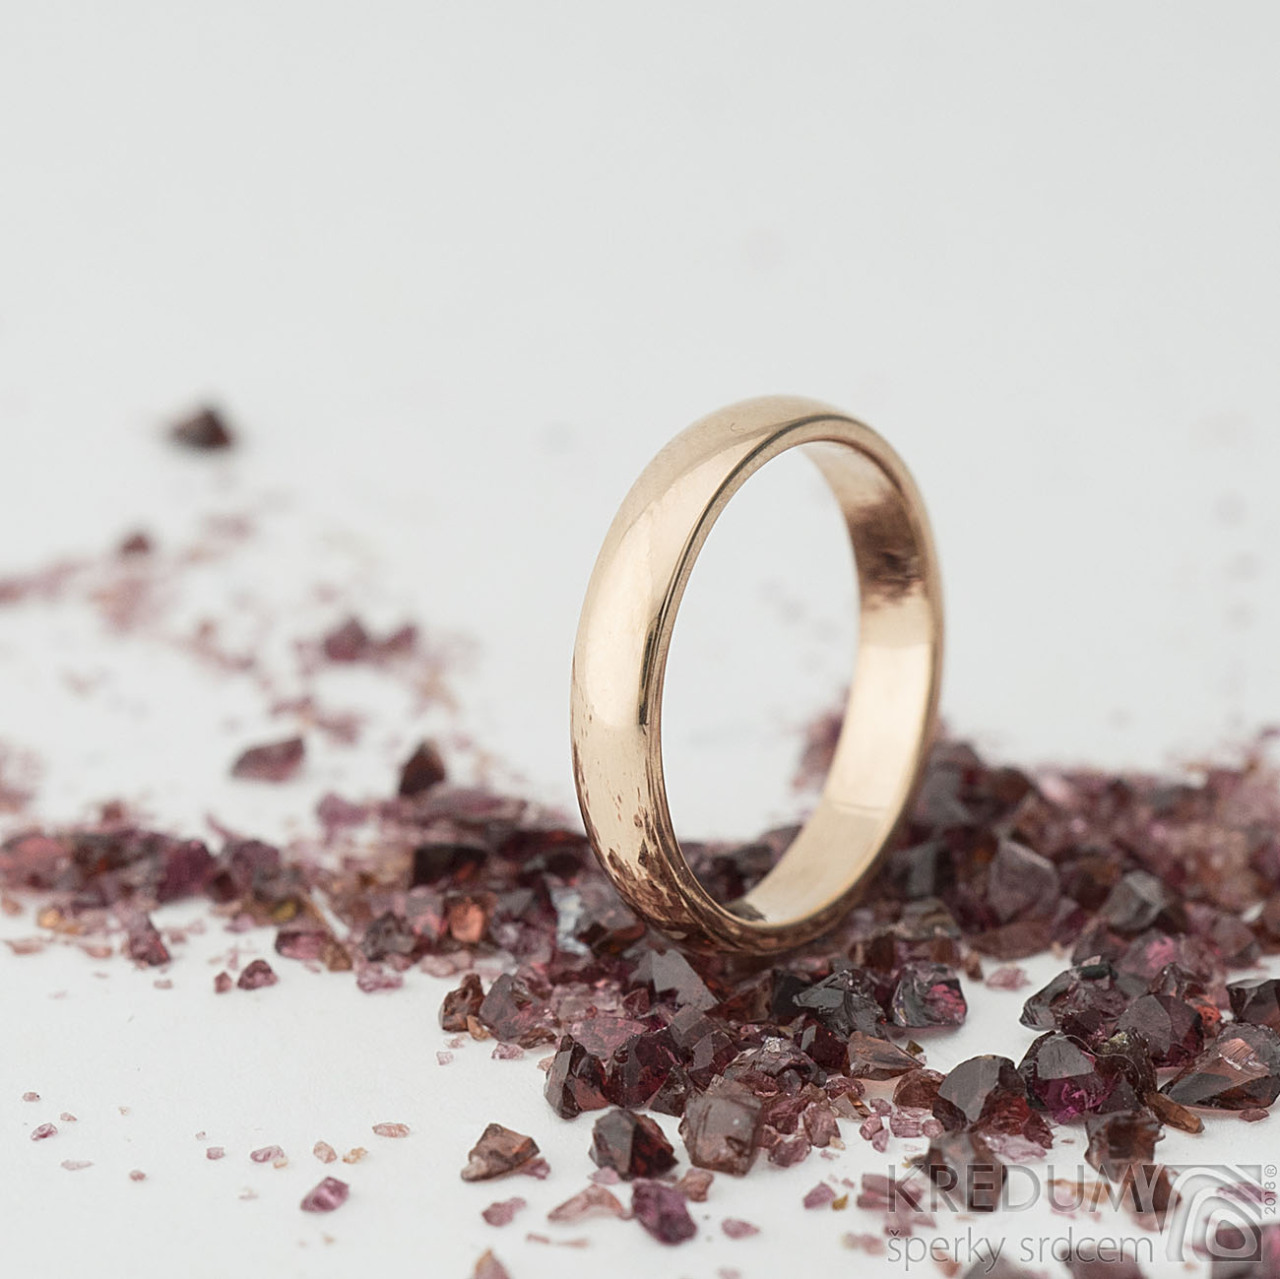 Klasik Gold Red Zlaty Snubni Prsten Vyroba Hand Made Snubni